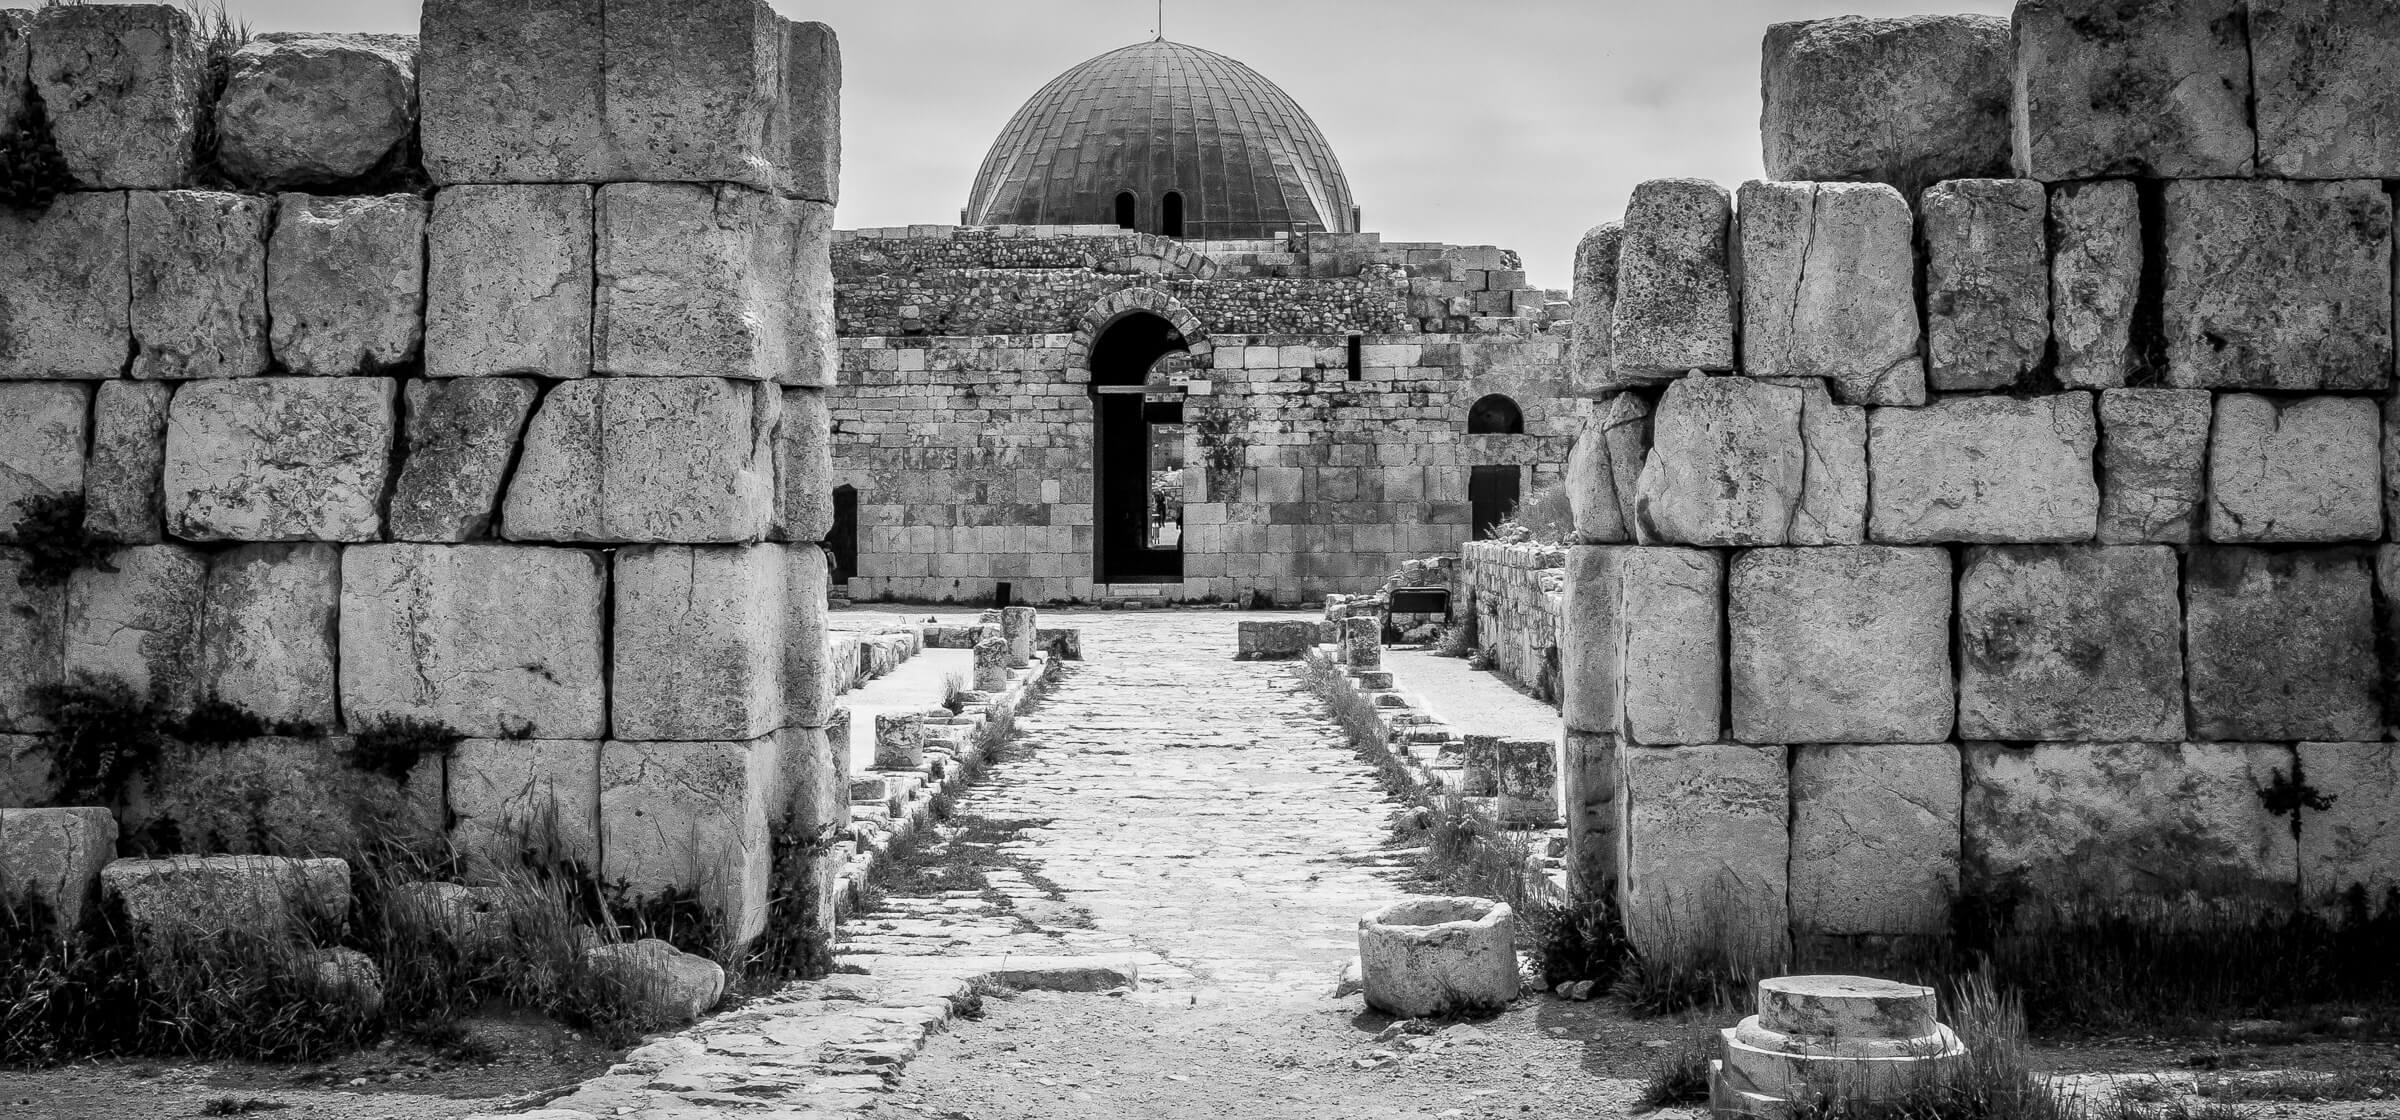 Umayyad Palace, Citadel, Amman, Jordan